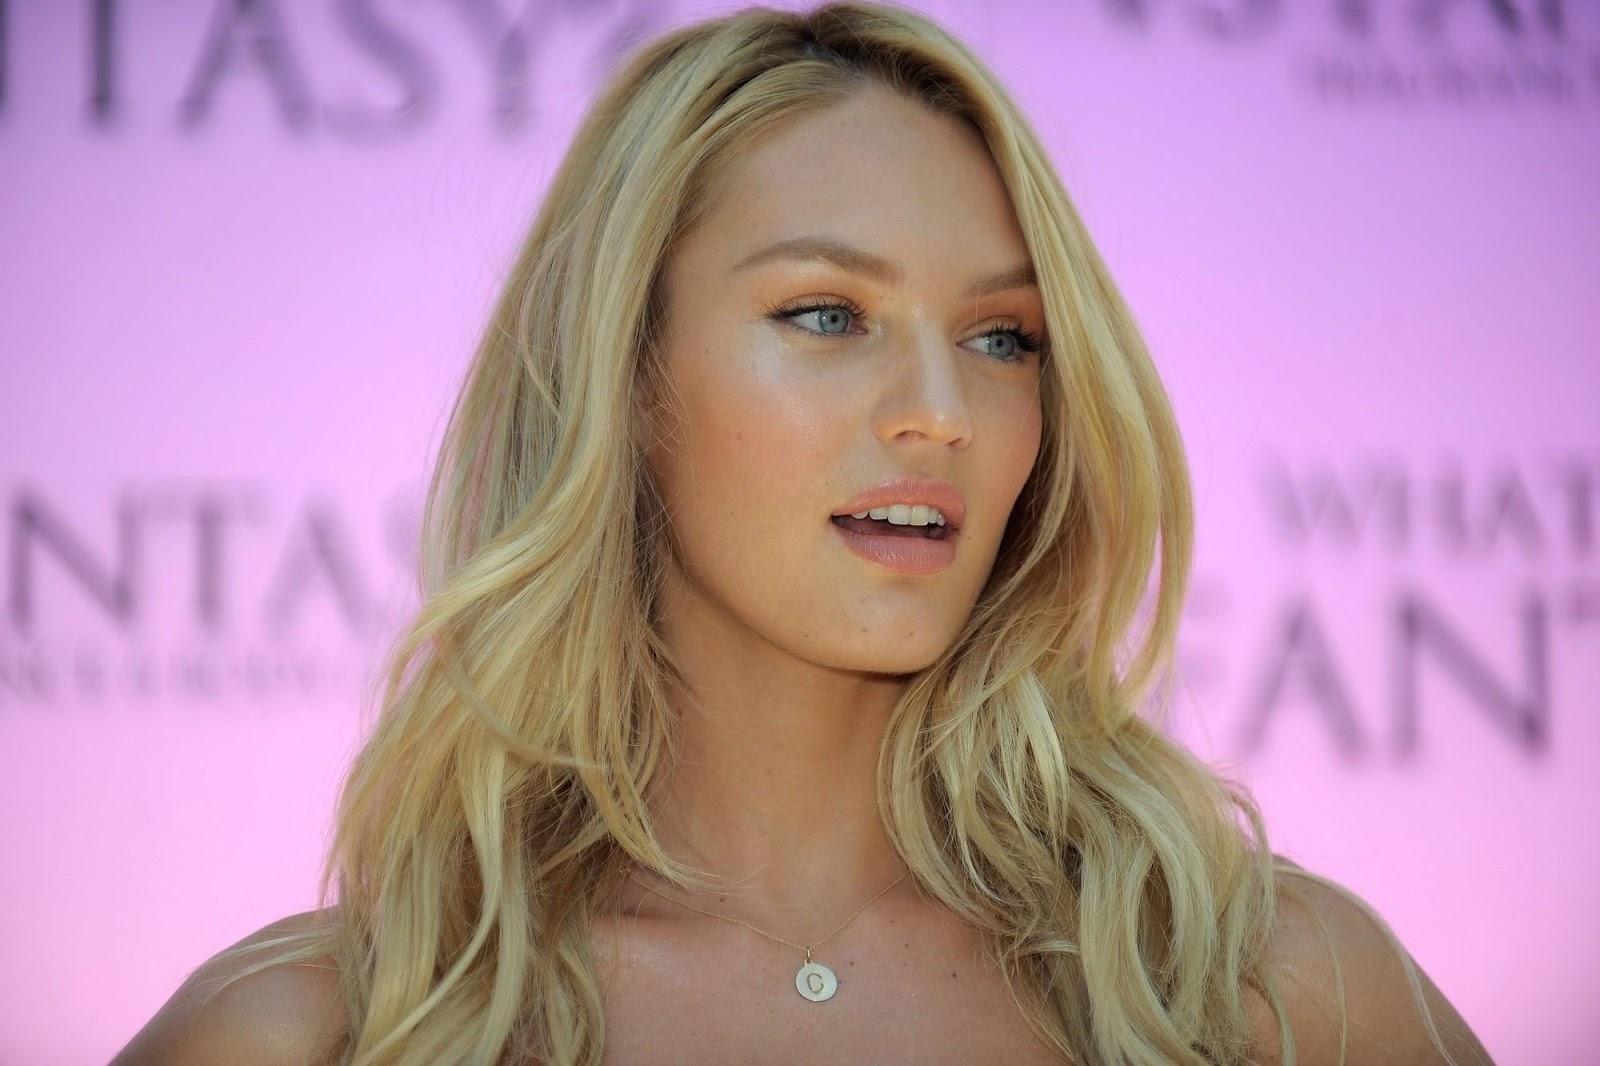 http://2.bp.blogspot.com/-9Sda2whUENA/UVgDzAm8k-I/AAAAAAAA5EI/aPQS_3jedC0/s1600/candice-swanepoel-blond-hair.jpg